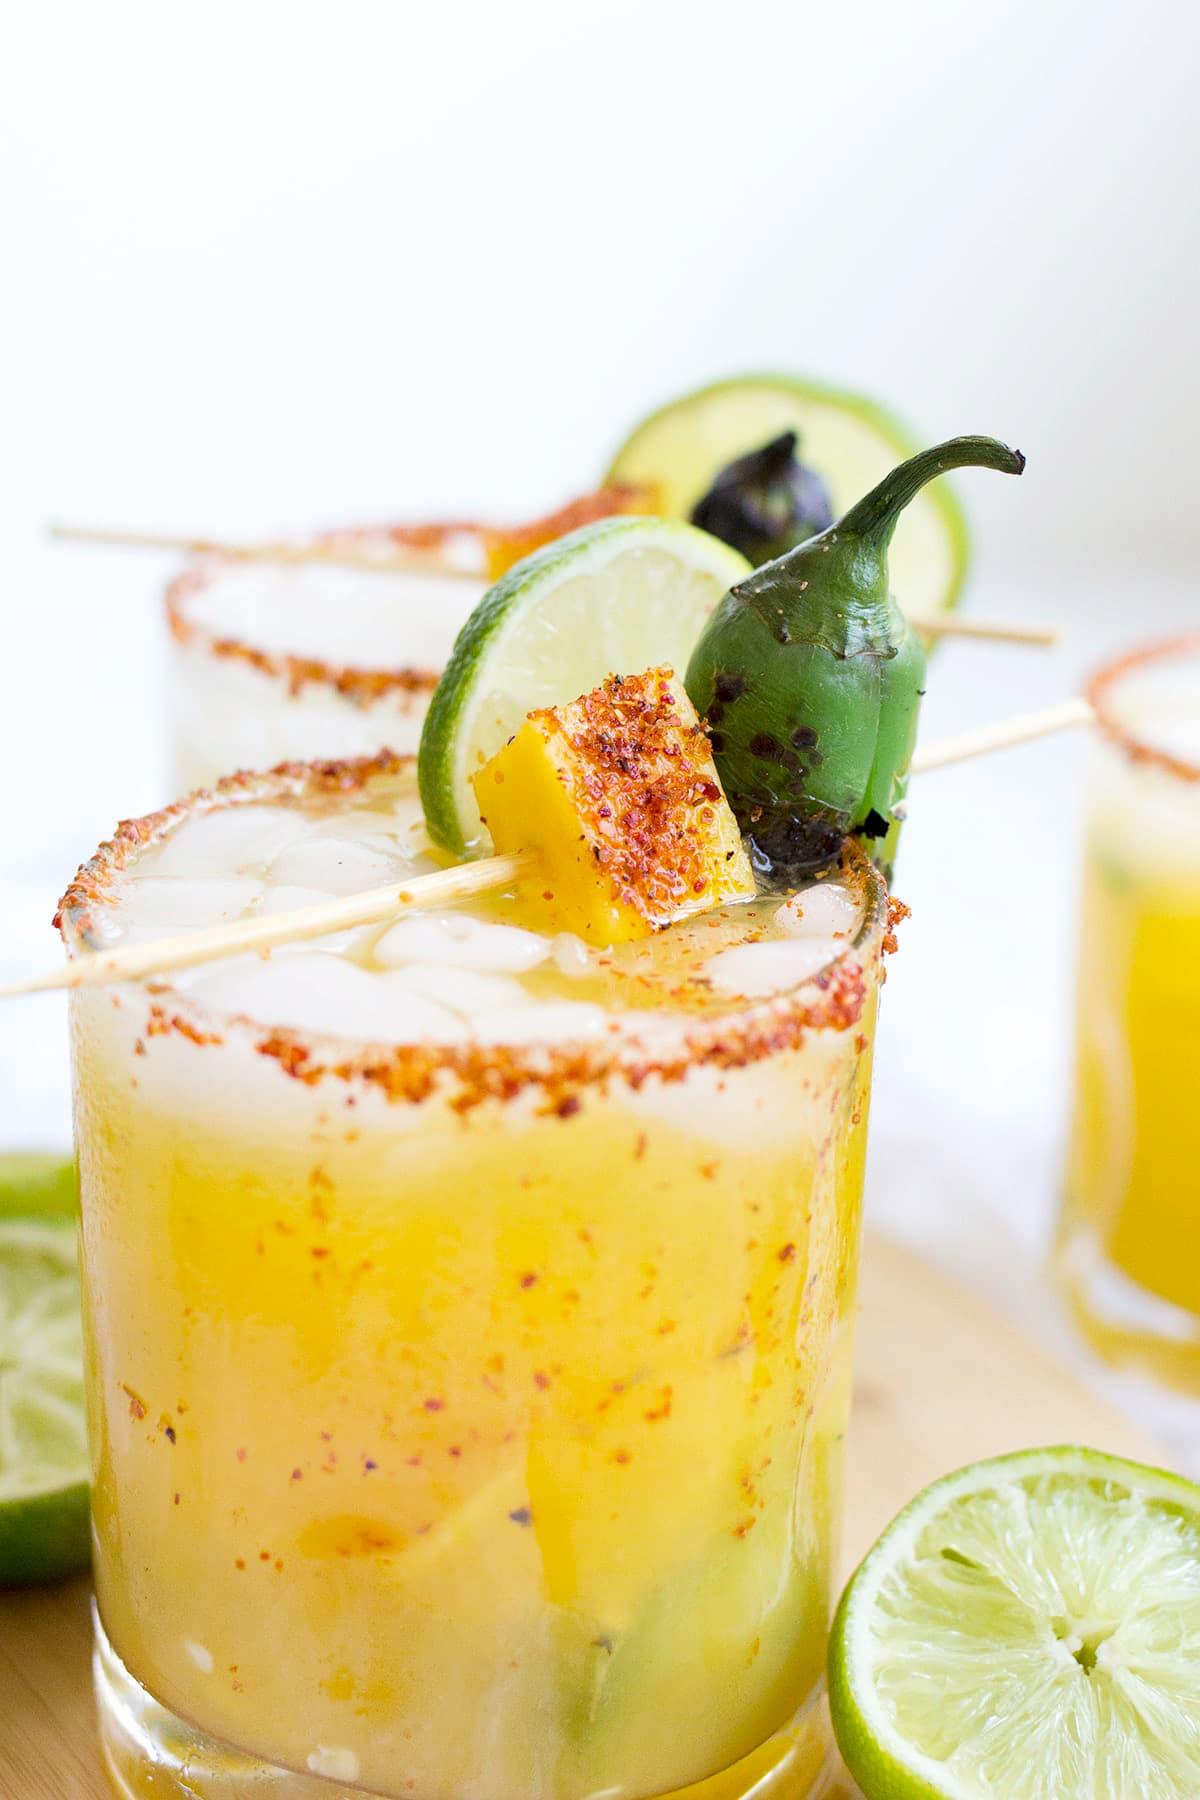 Spicy Mango Jalapeño Margarita